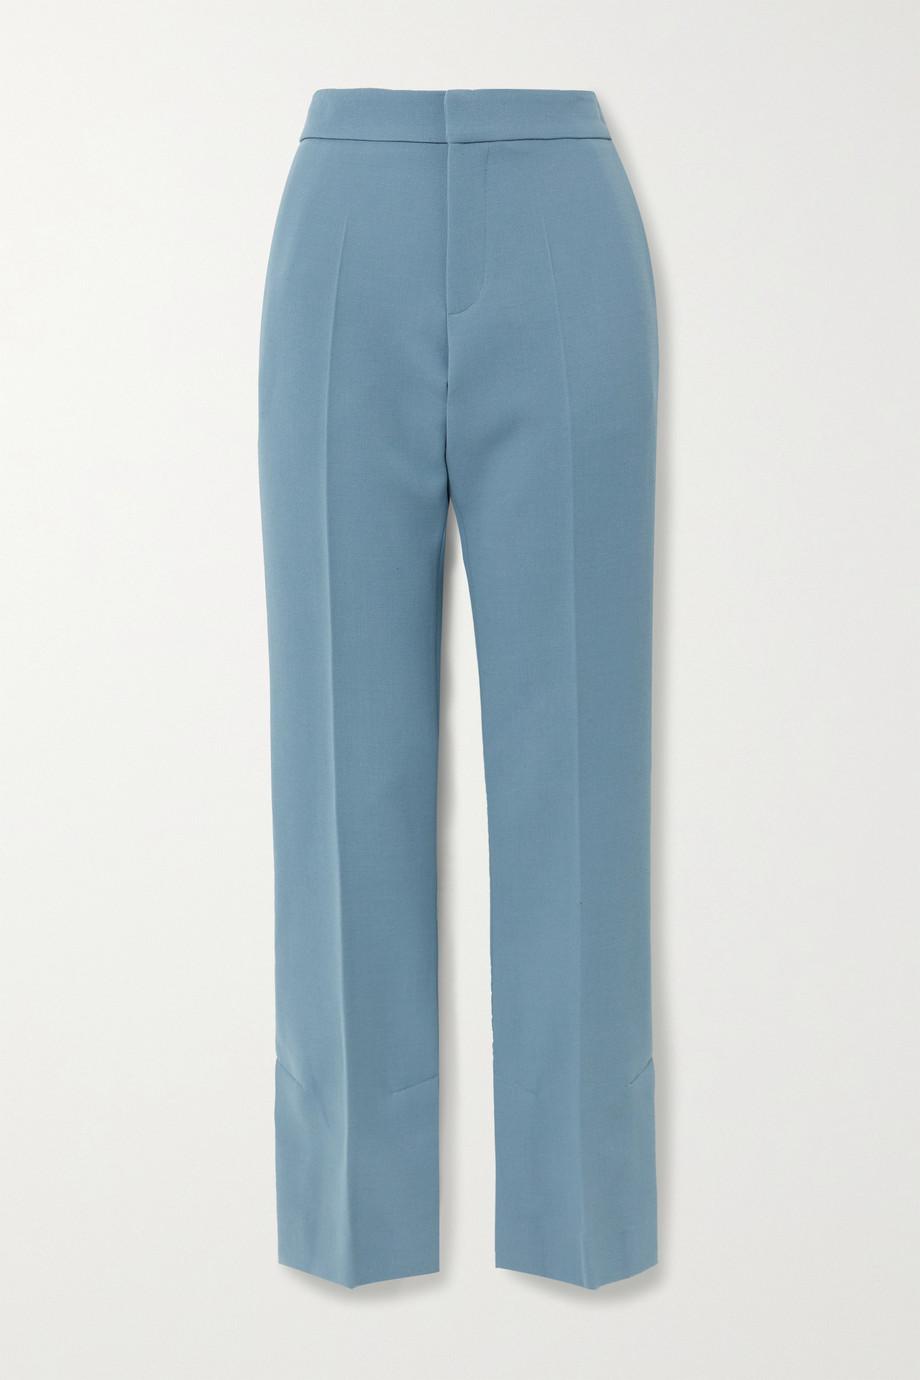 GAUCHERE Robyn wool straight-leg pants